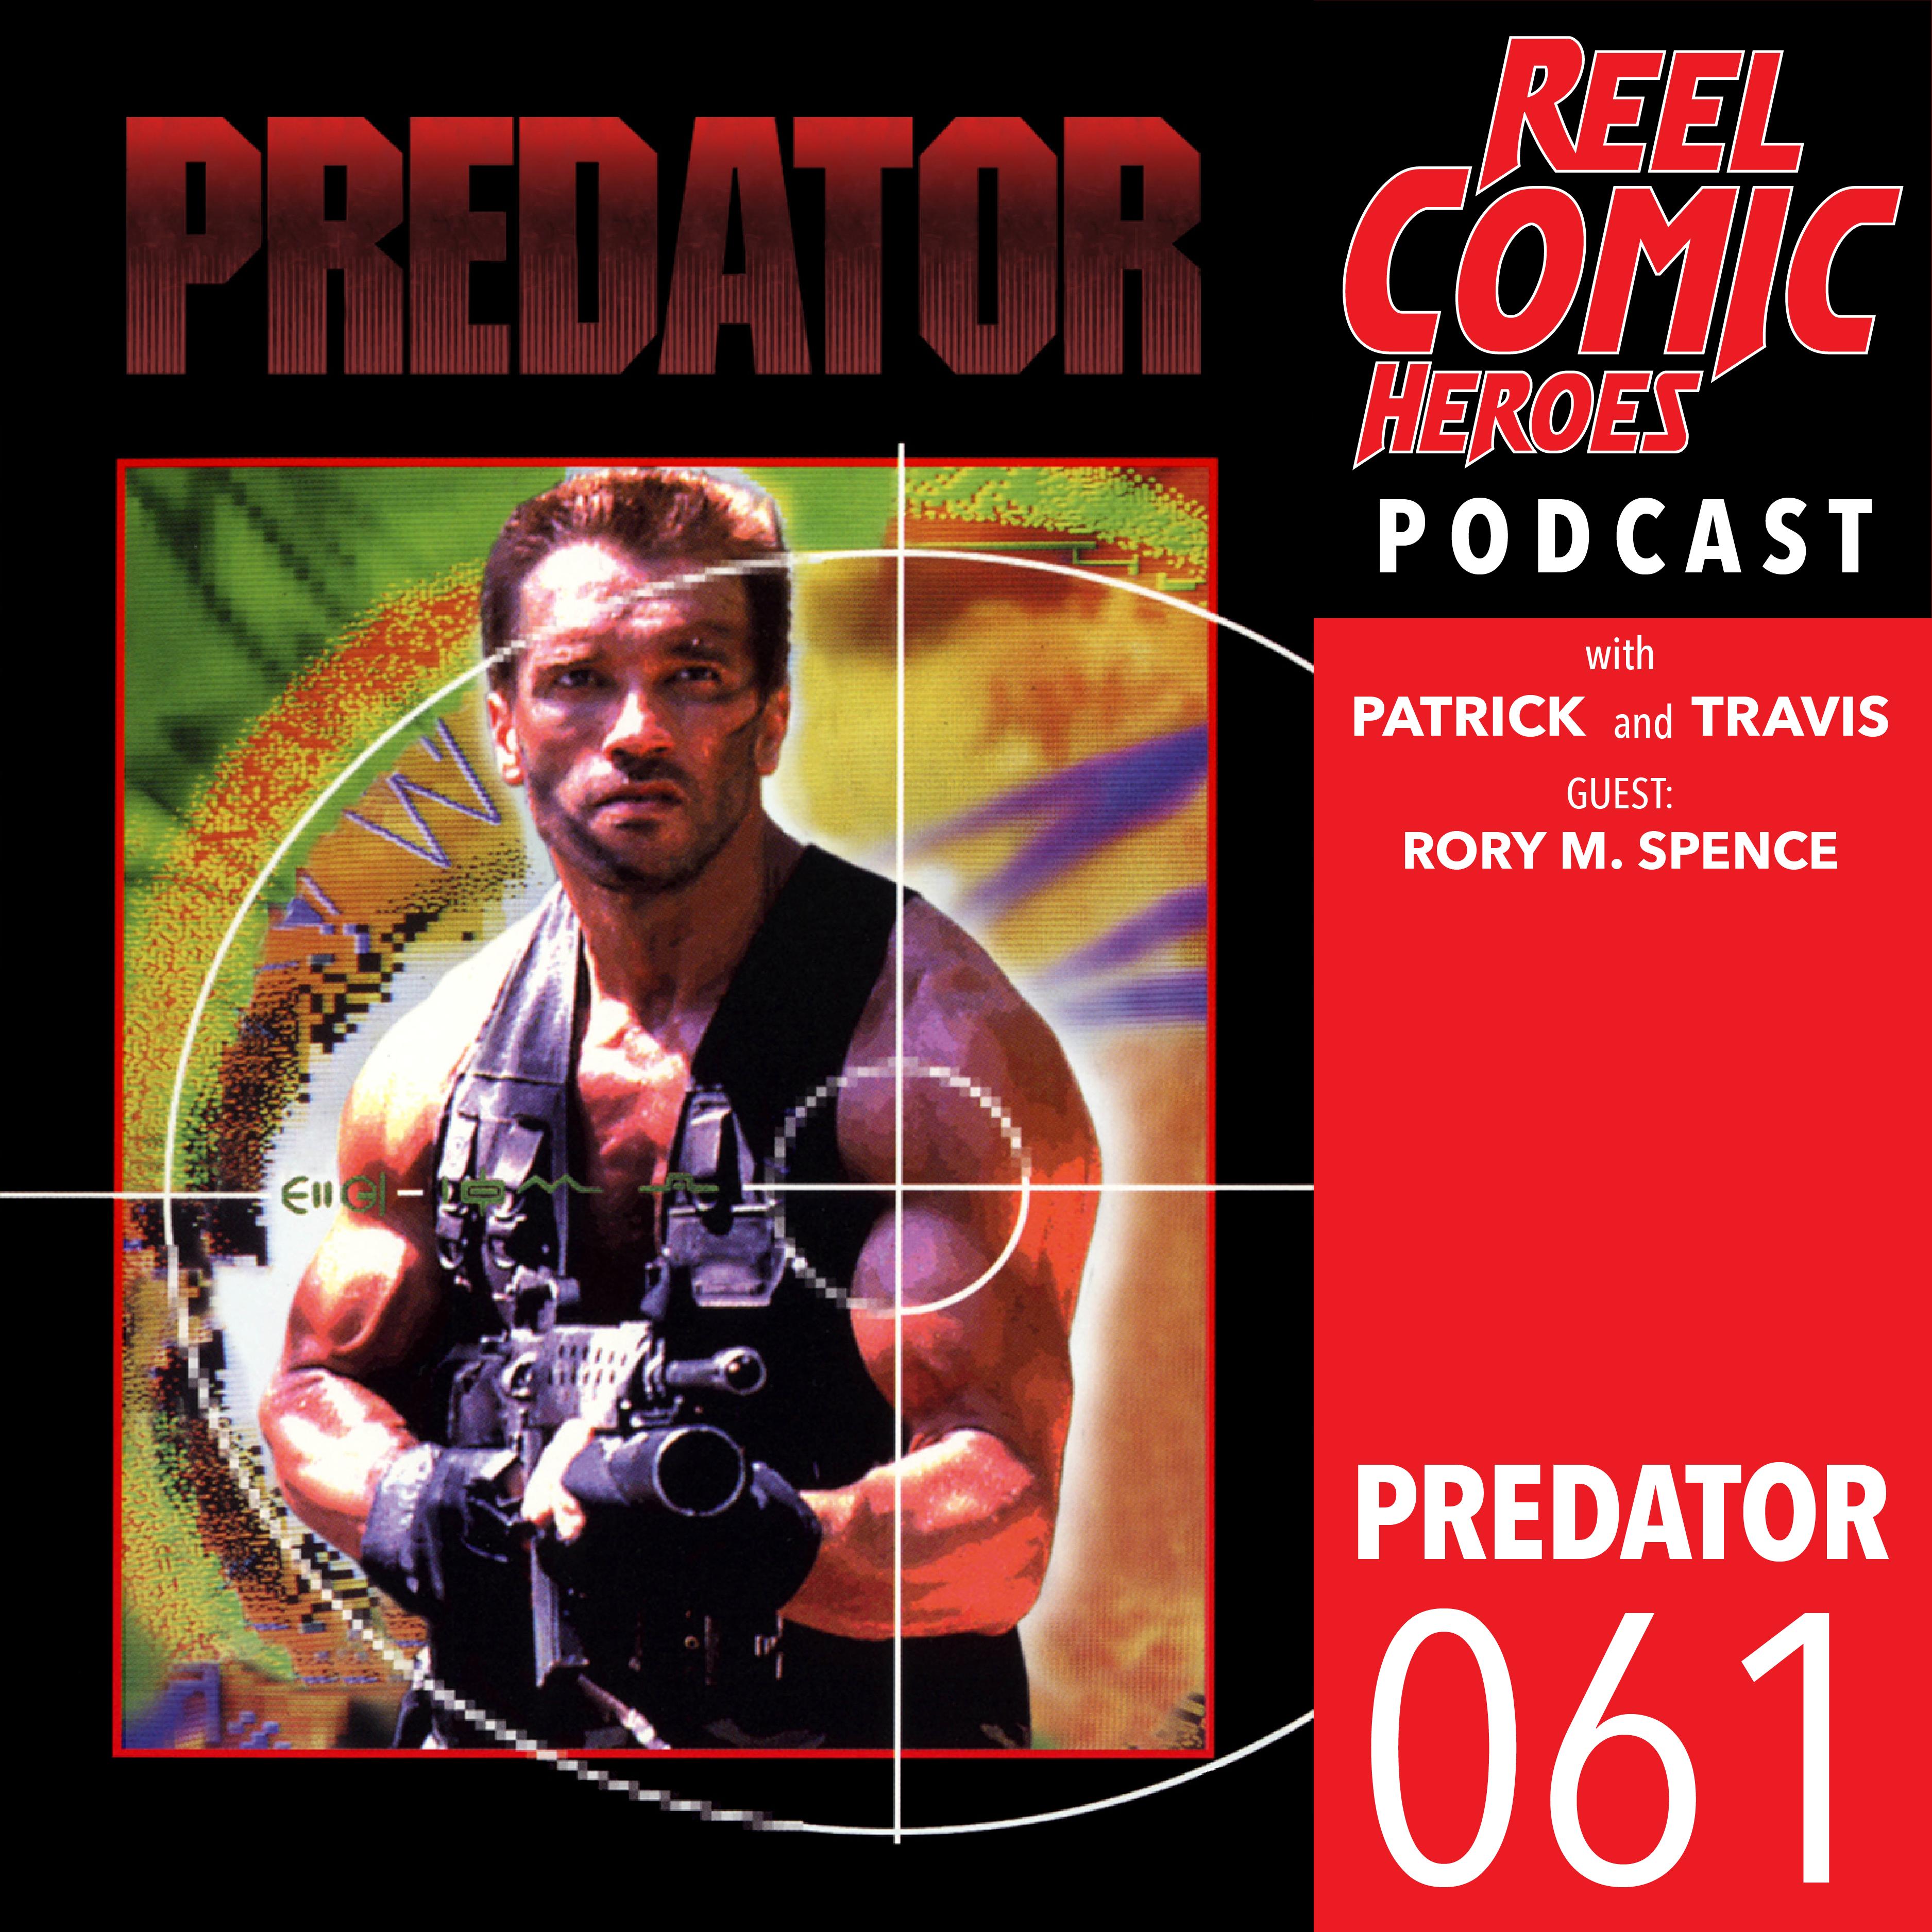 Artwork for Reel Comic Heroes 061 - Predator